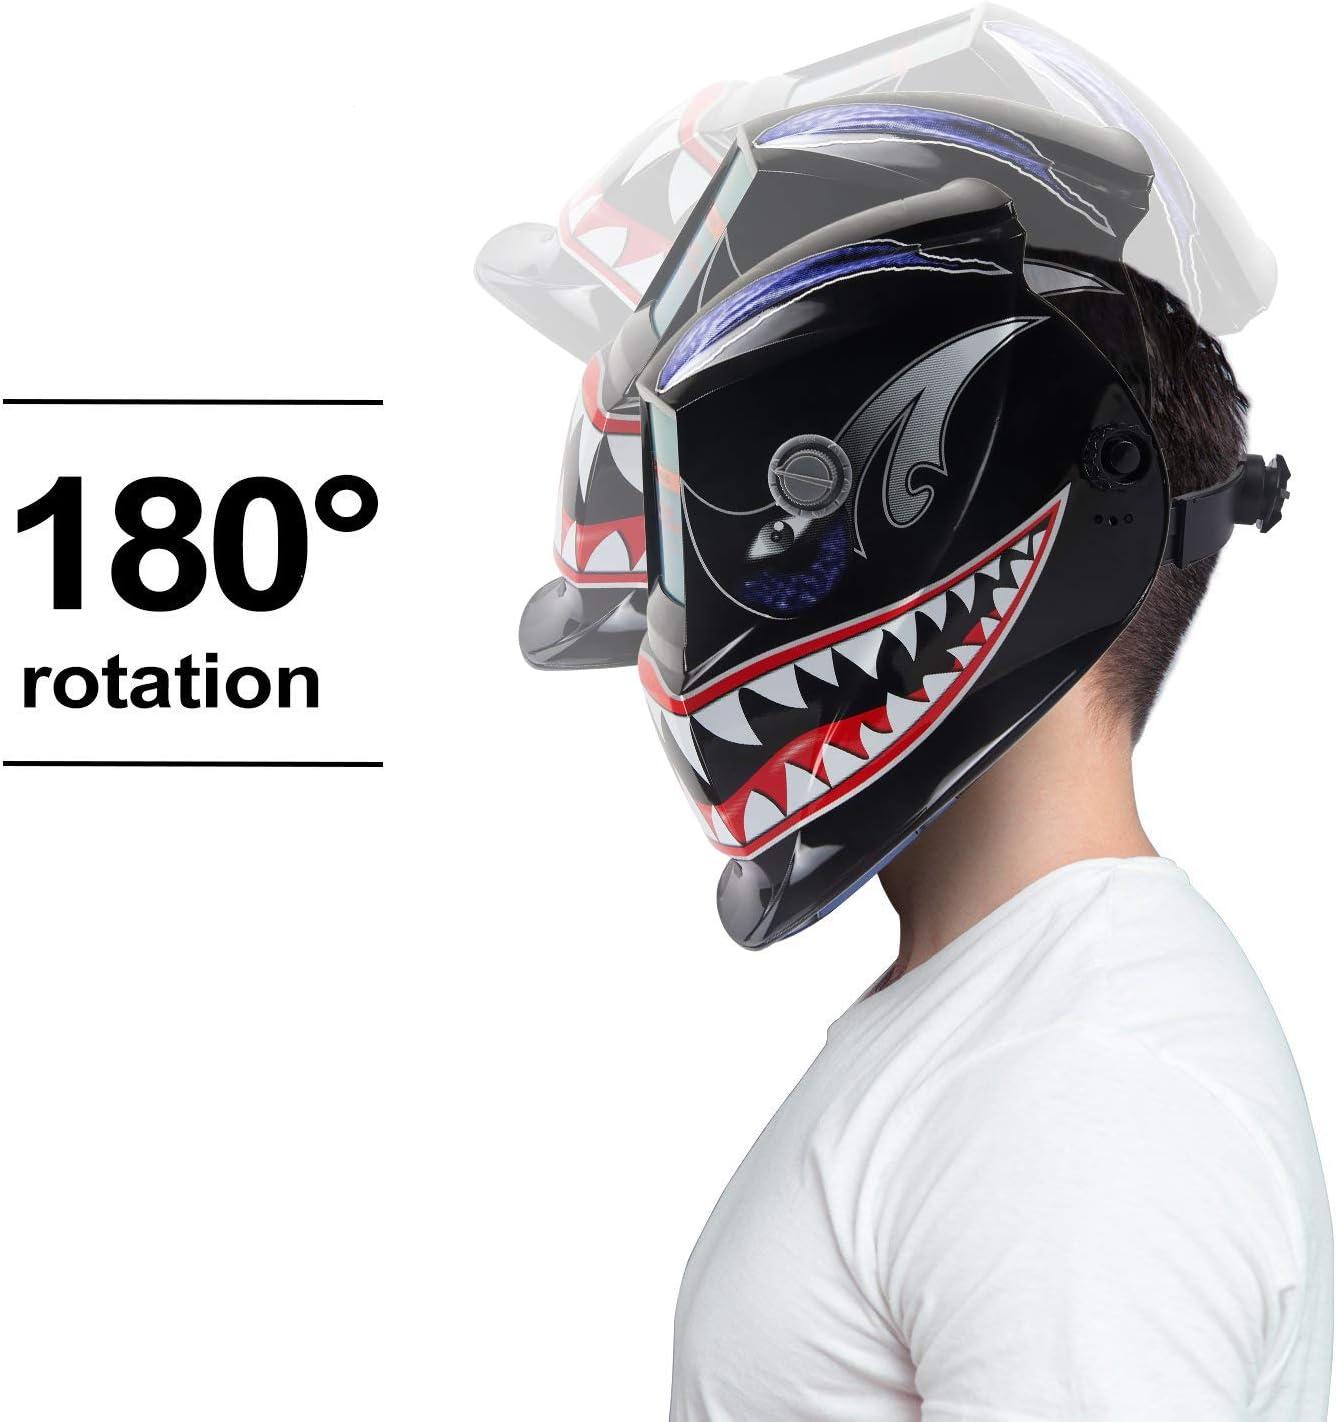 Saldatura Viso Protezione OHMOTOR Maschera per Saldatura Casco per Saldatura Automatico scurimento Saldatore Maschera